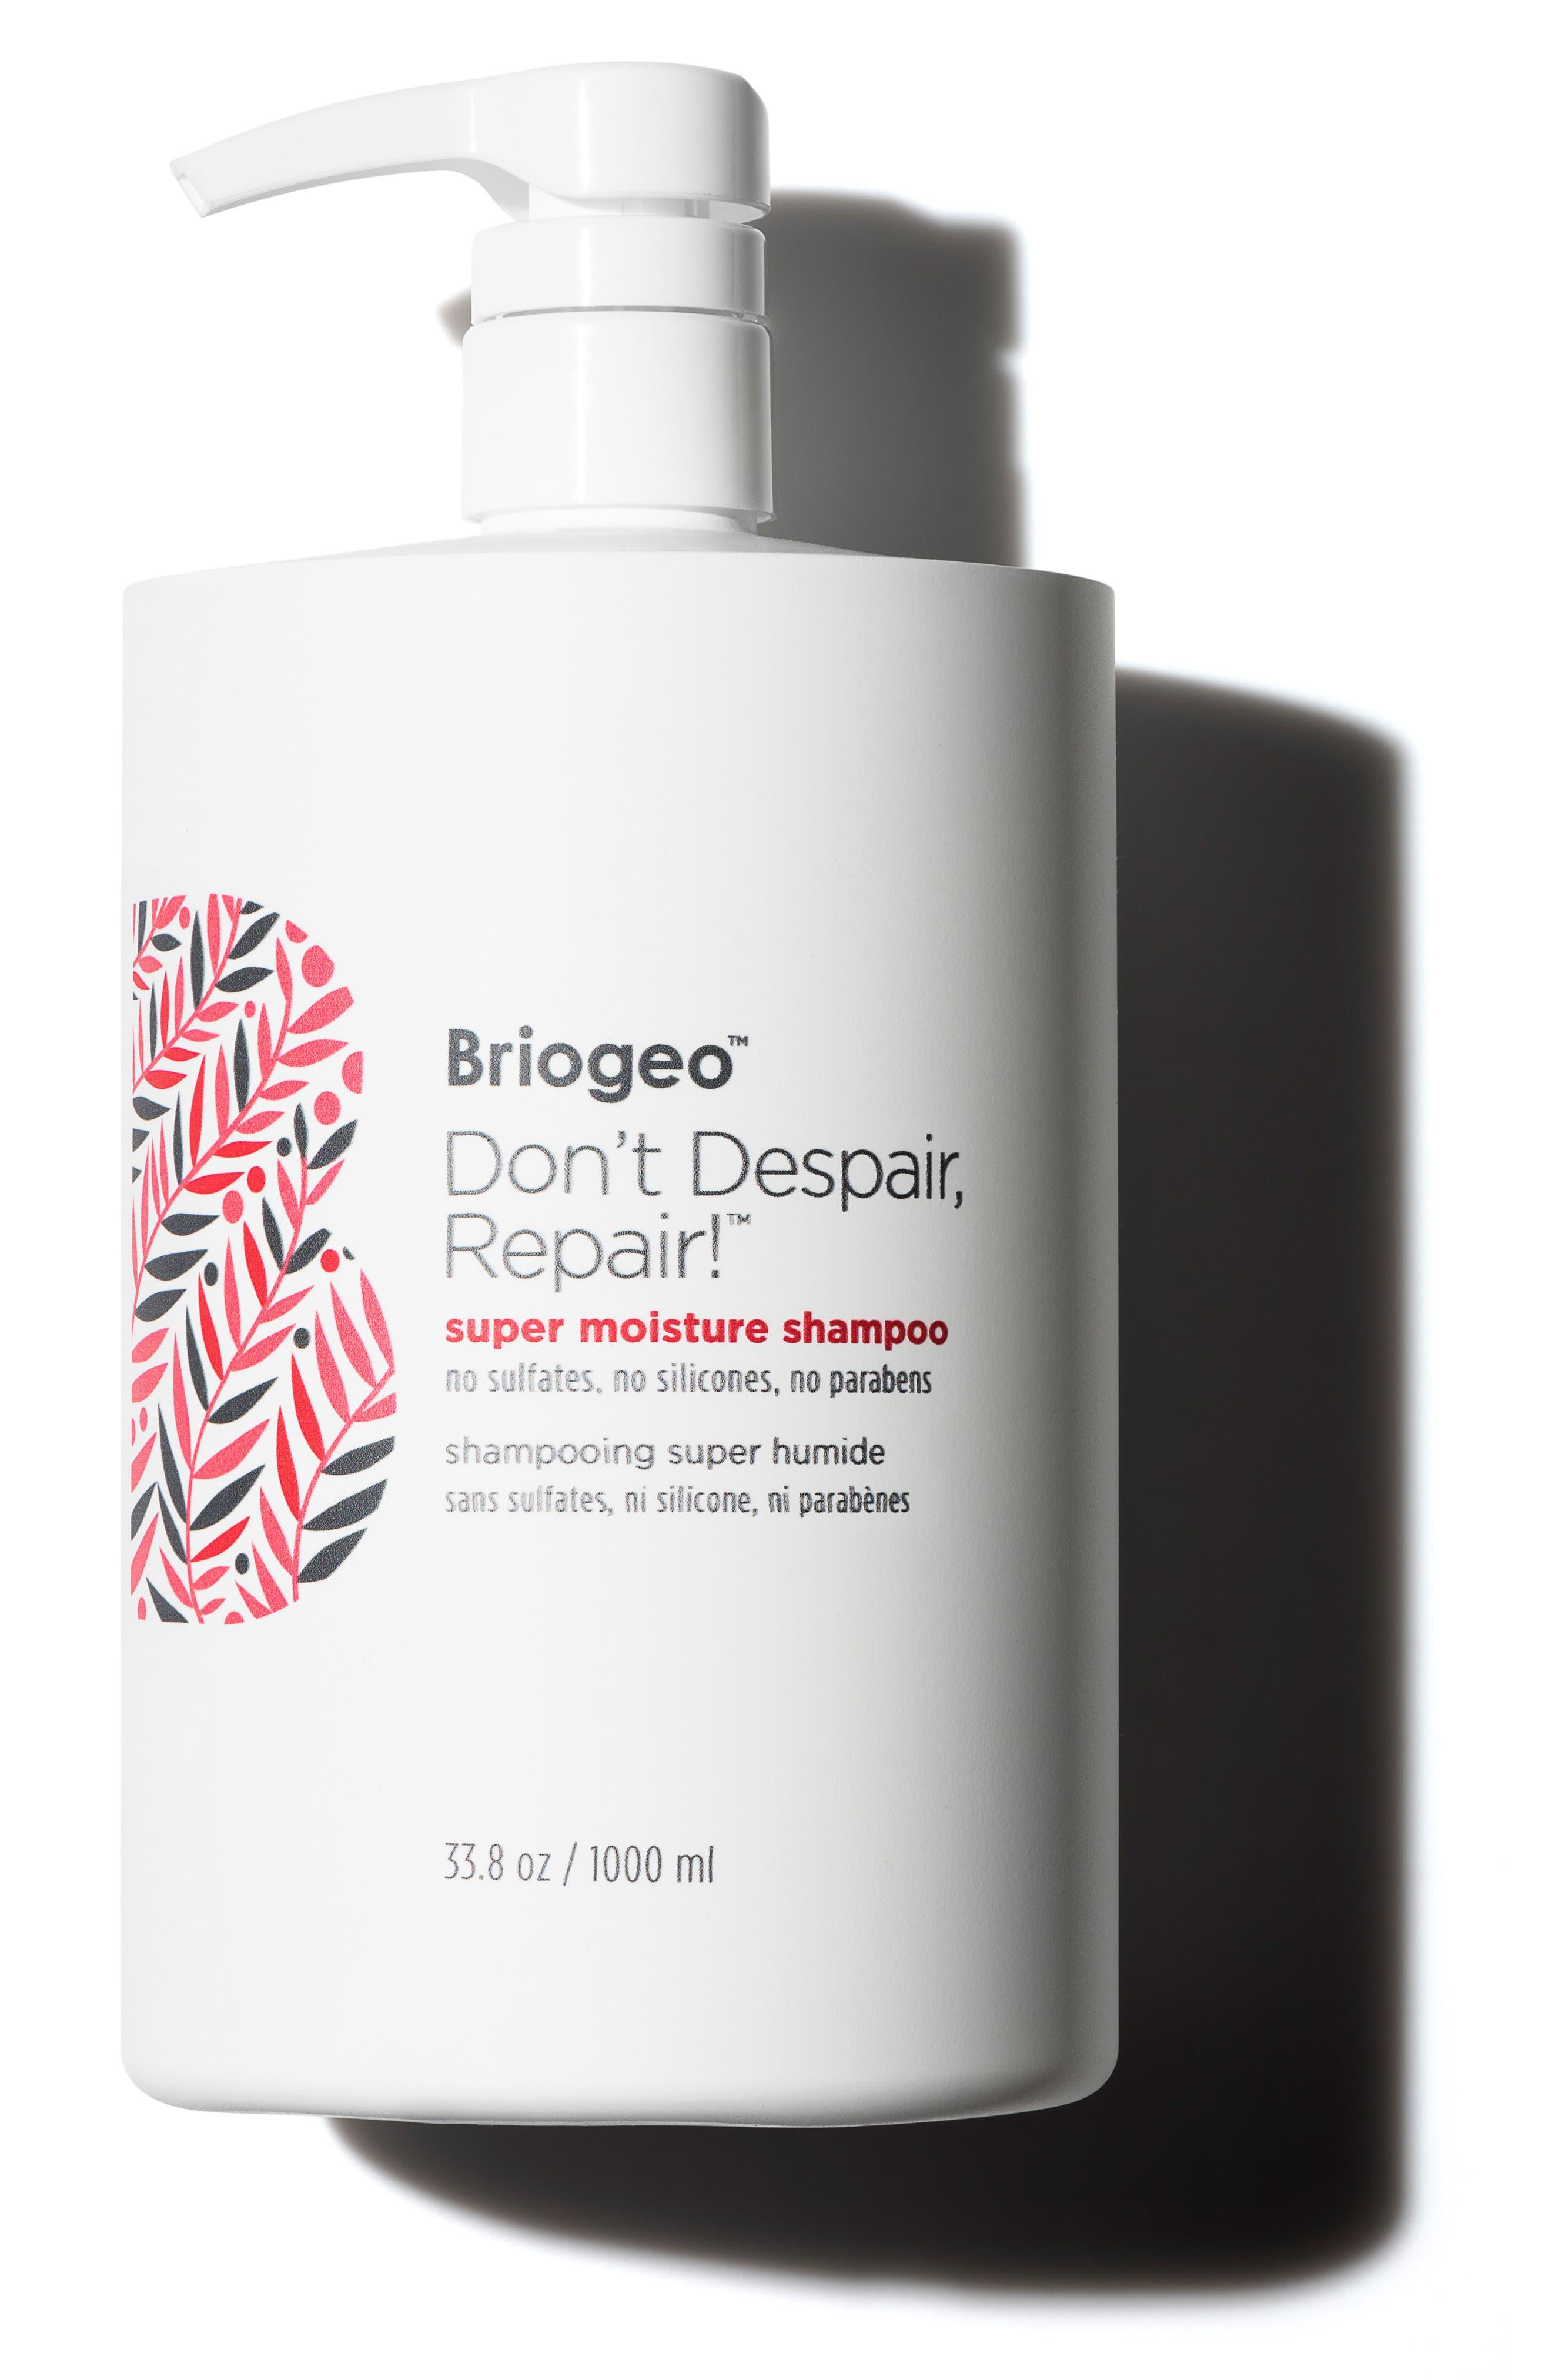 BRIOGEO, Don't Despair, Repair! Super Moisture Shampoo, Alternate thumbnail 3, color, NO COLOR